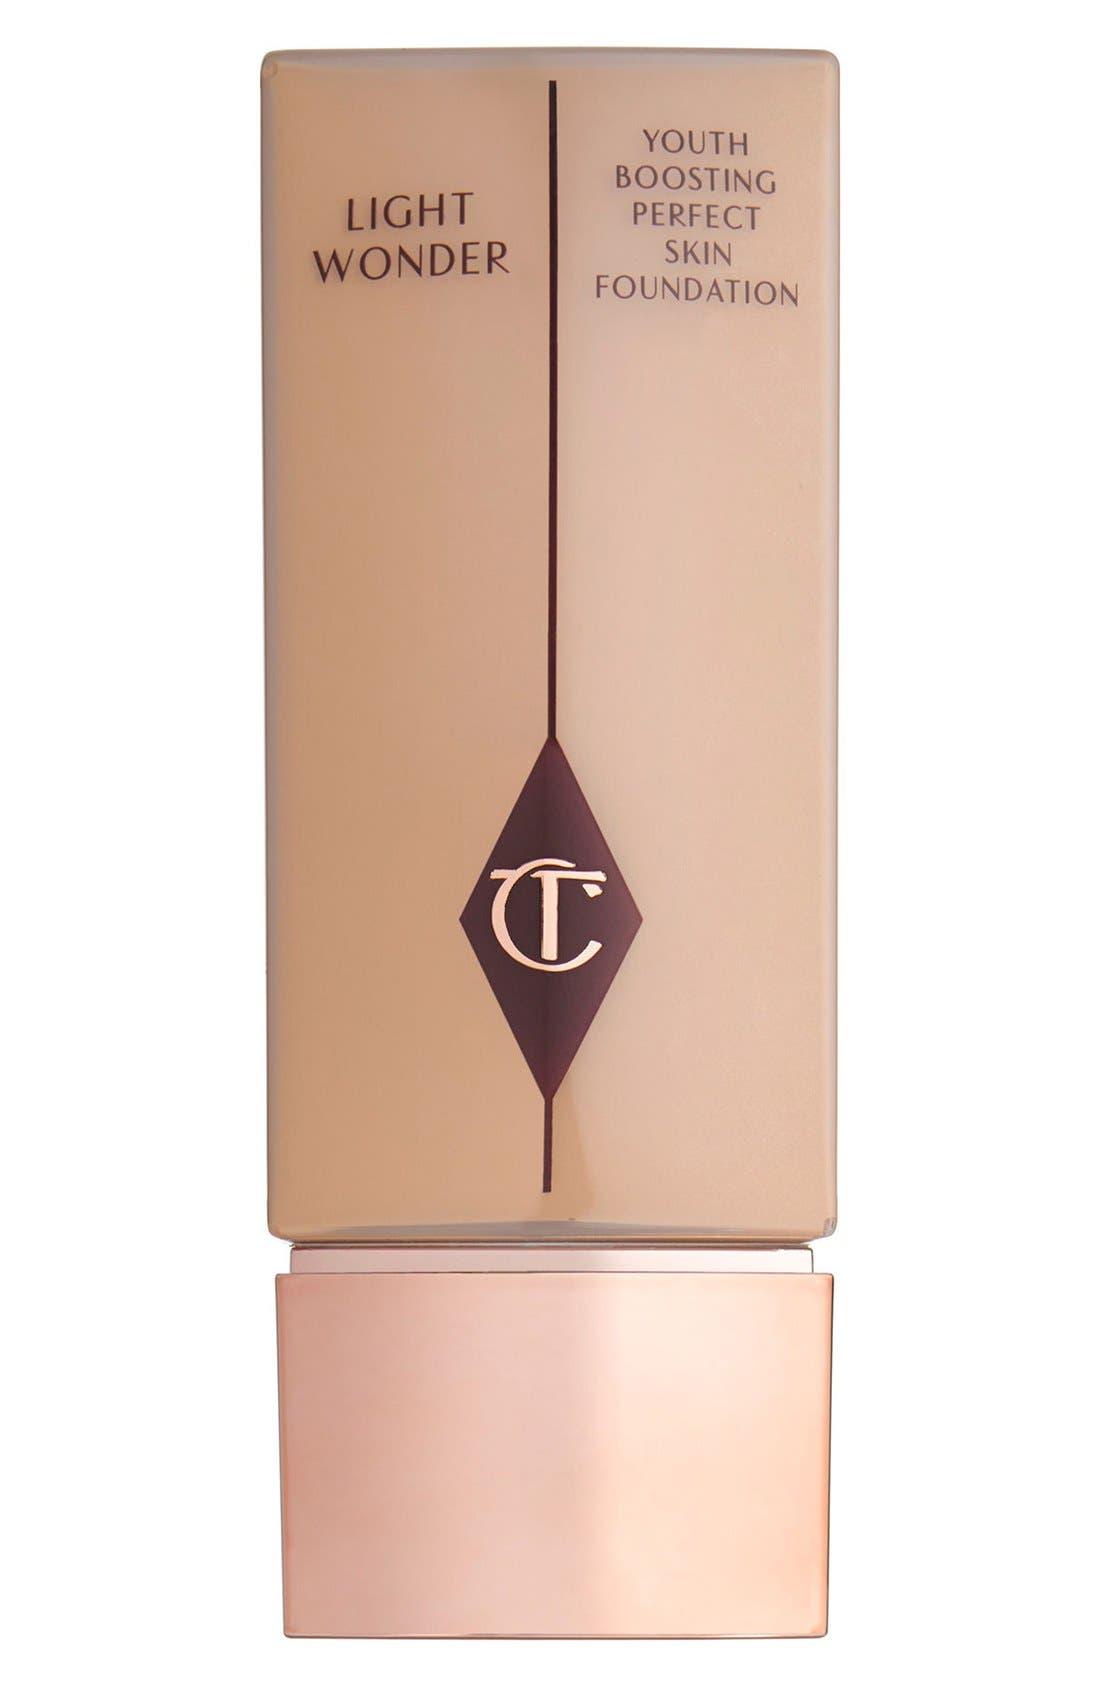 Charlotte Tilbury Light Wonder Youth-Boosting Perfect Skin Foundation